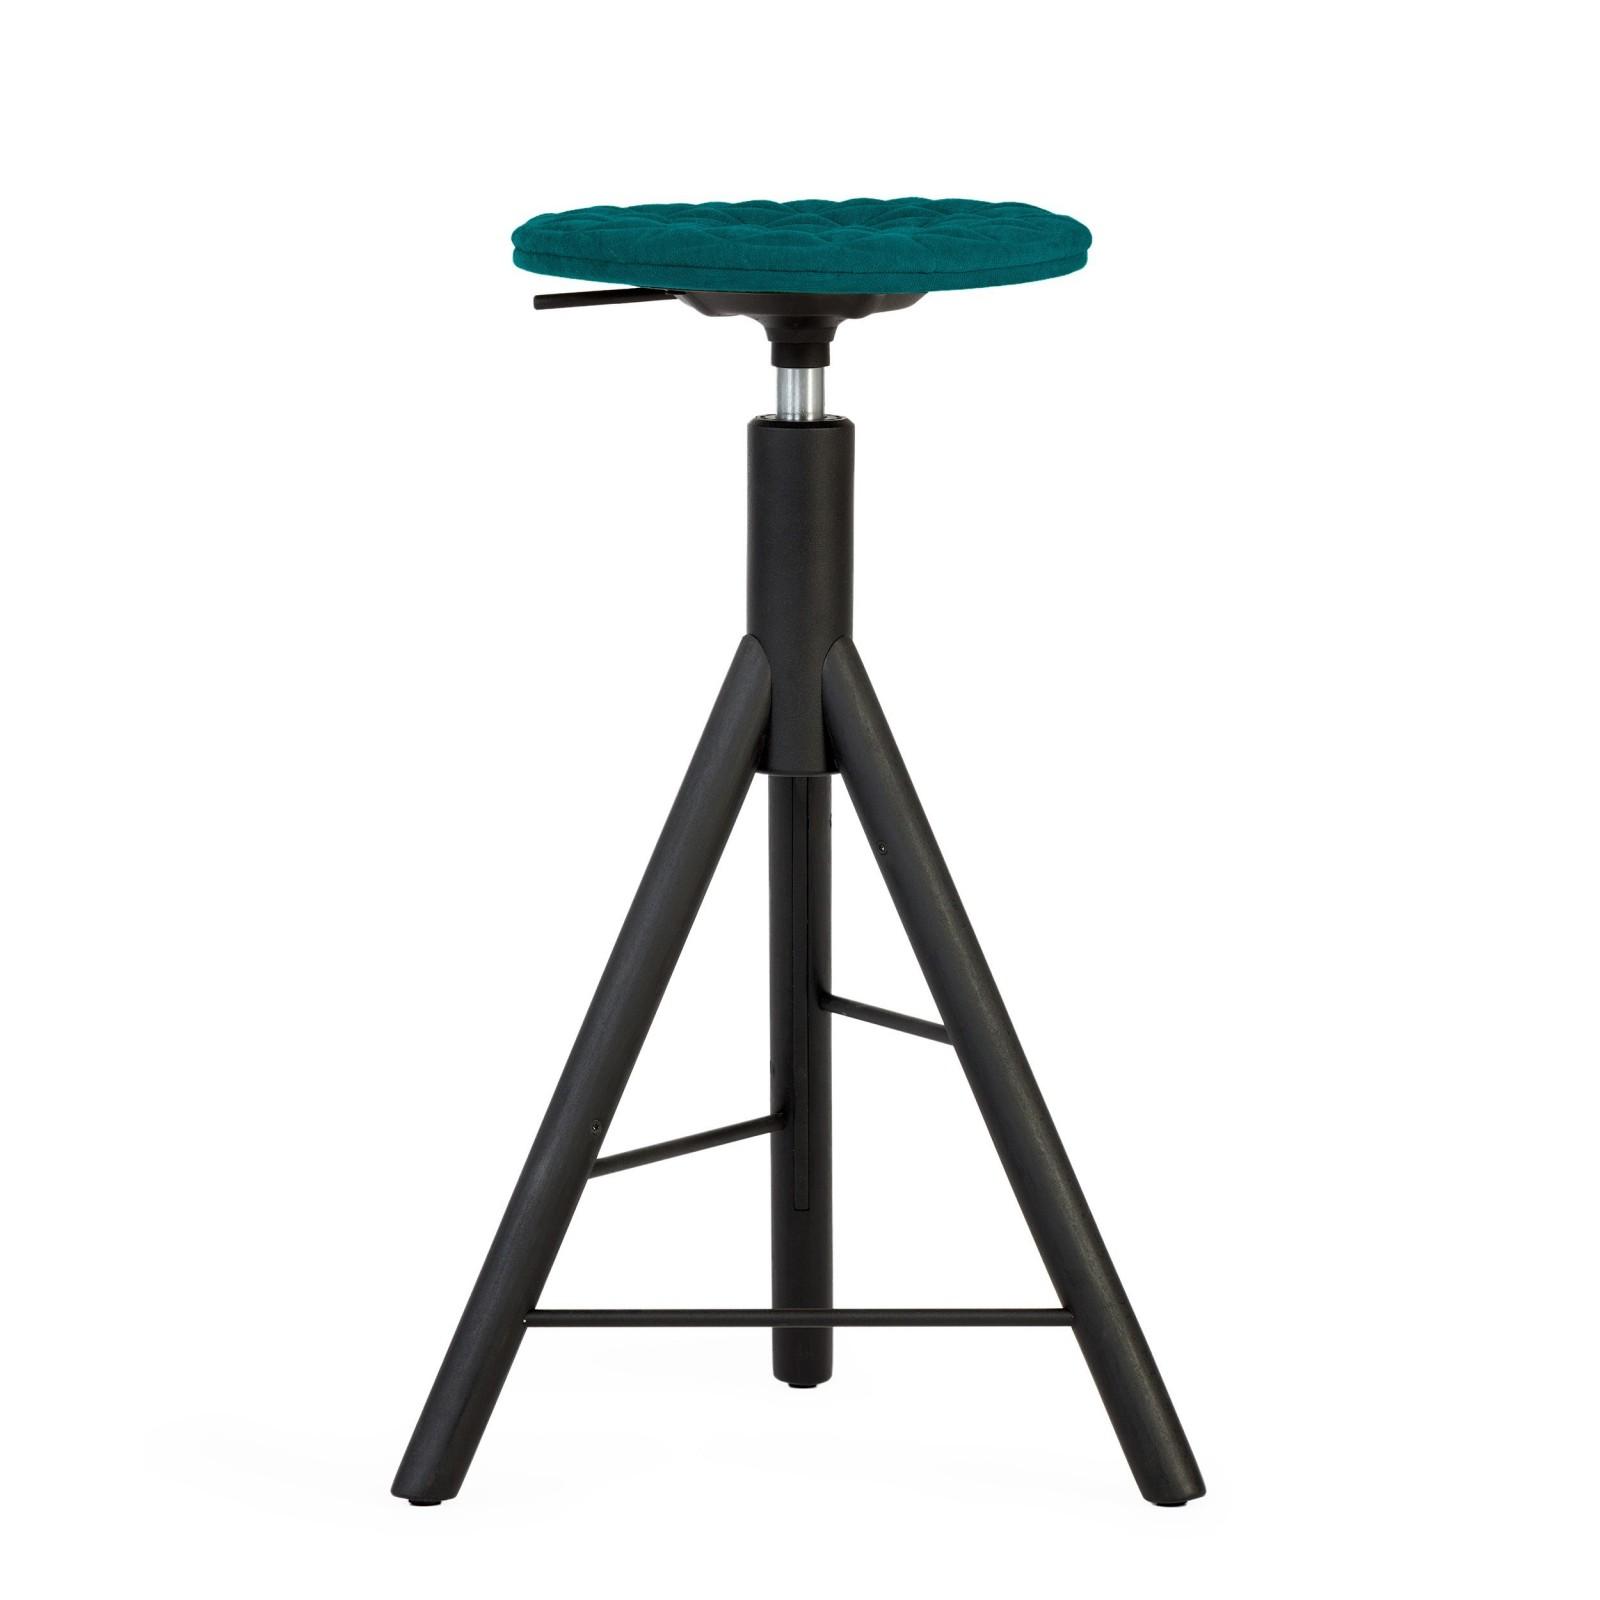 MannequinBar chair - 01 - turquoise